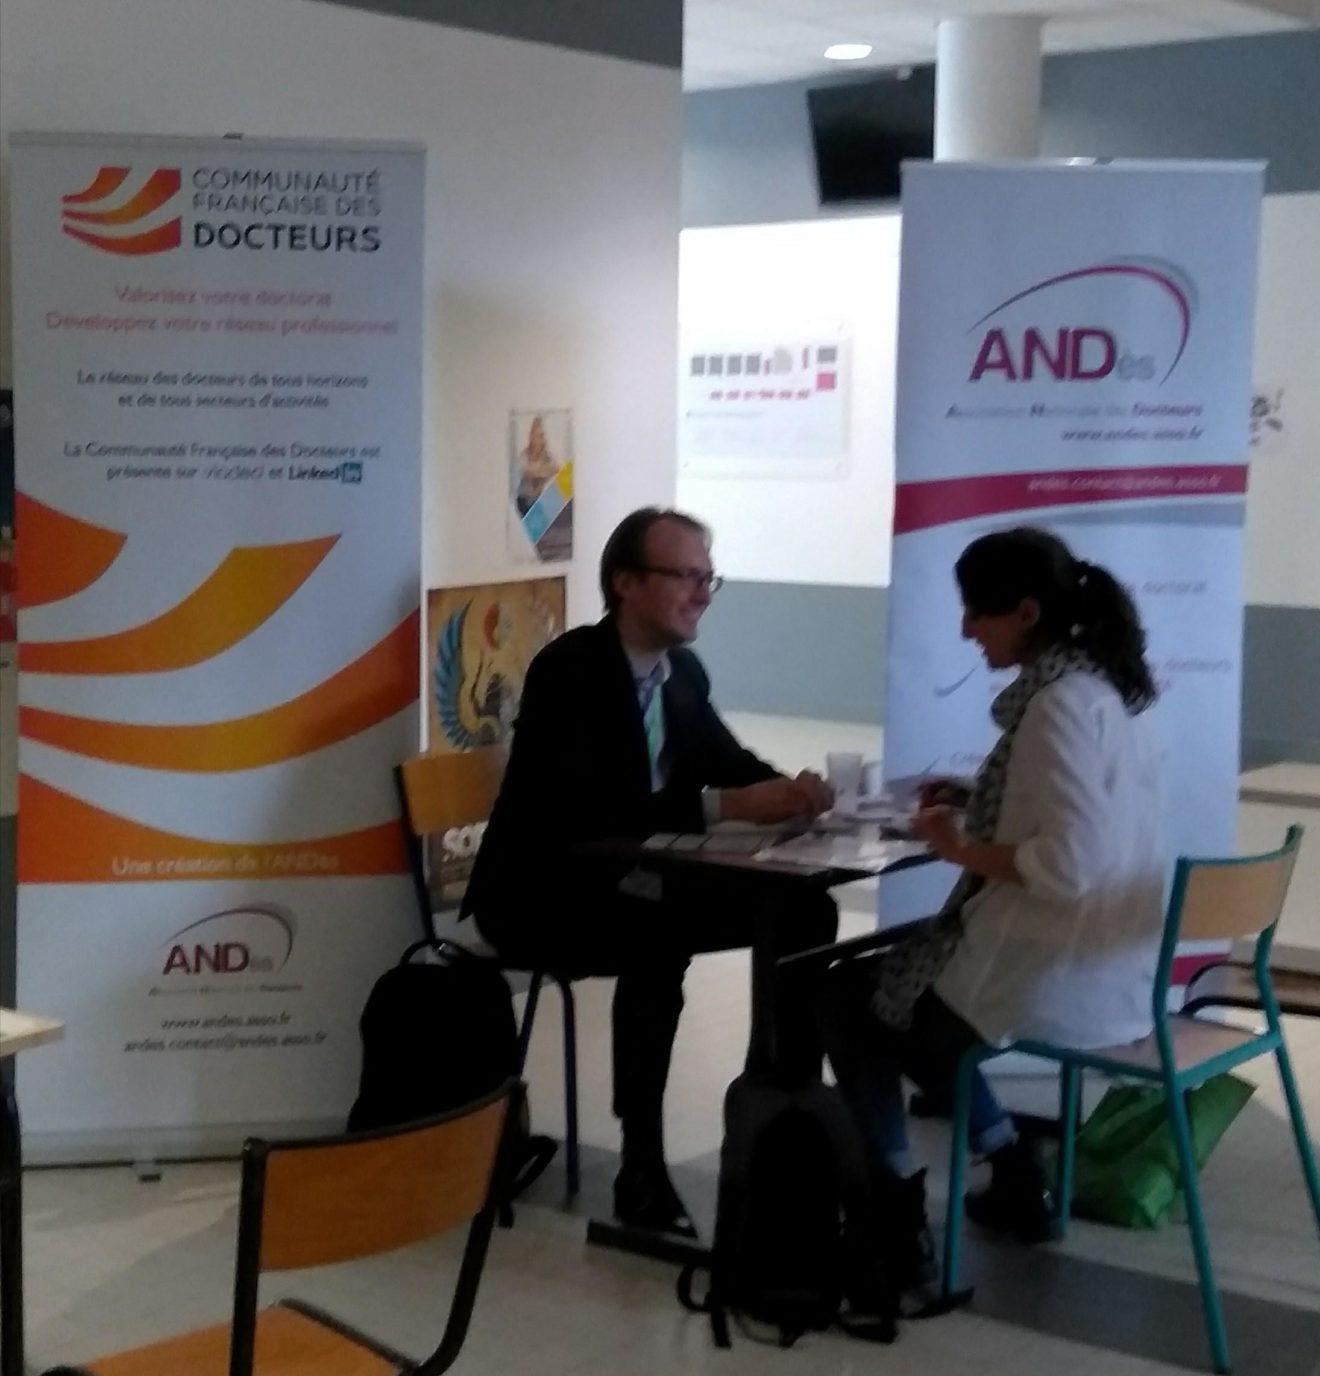 Forum-AquiDoc-2019-Stand-ANDès